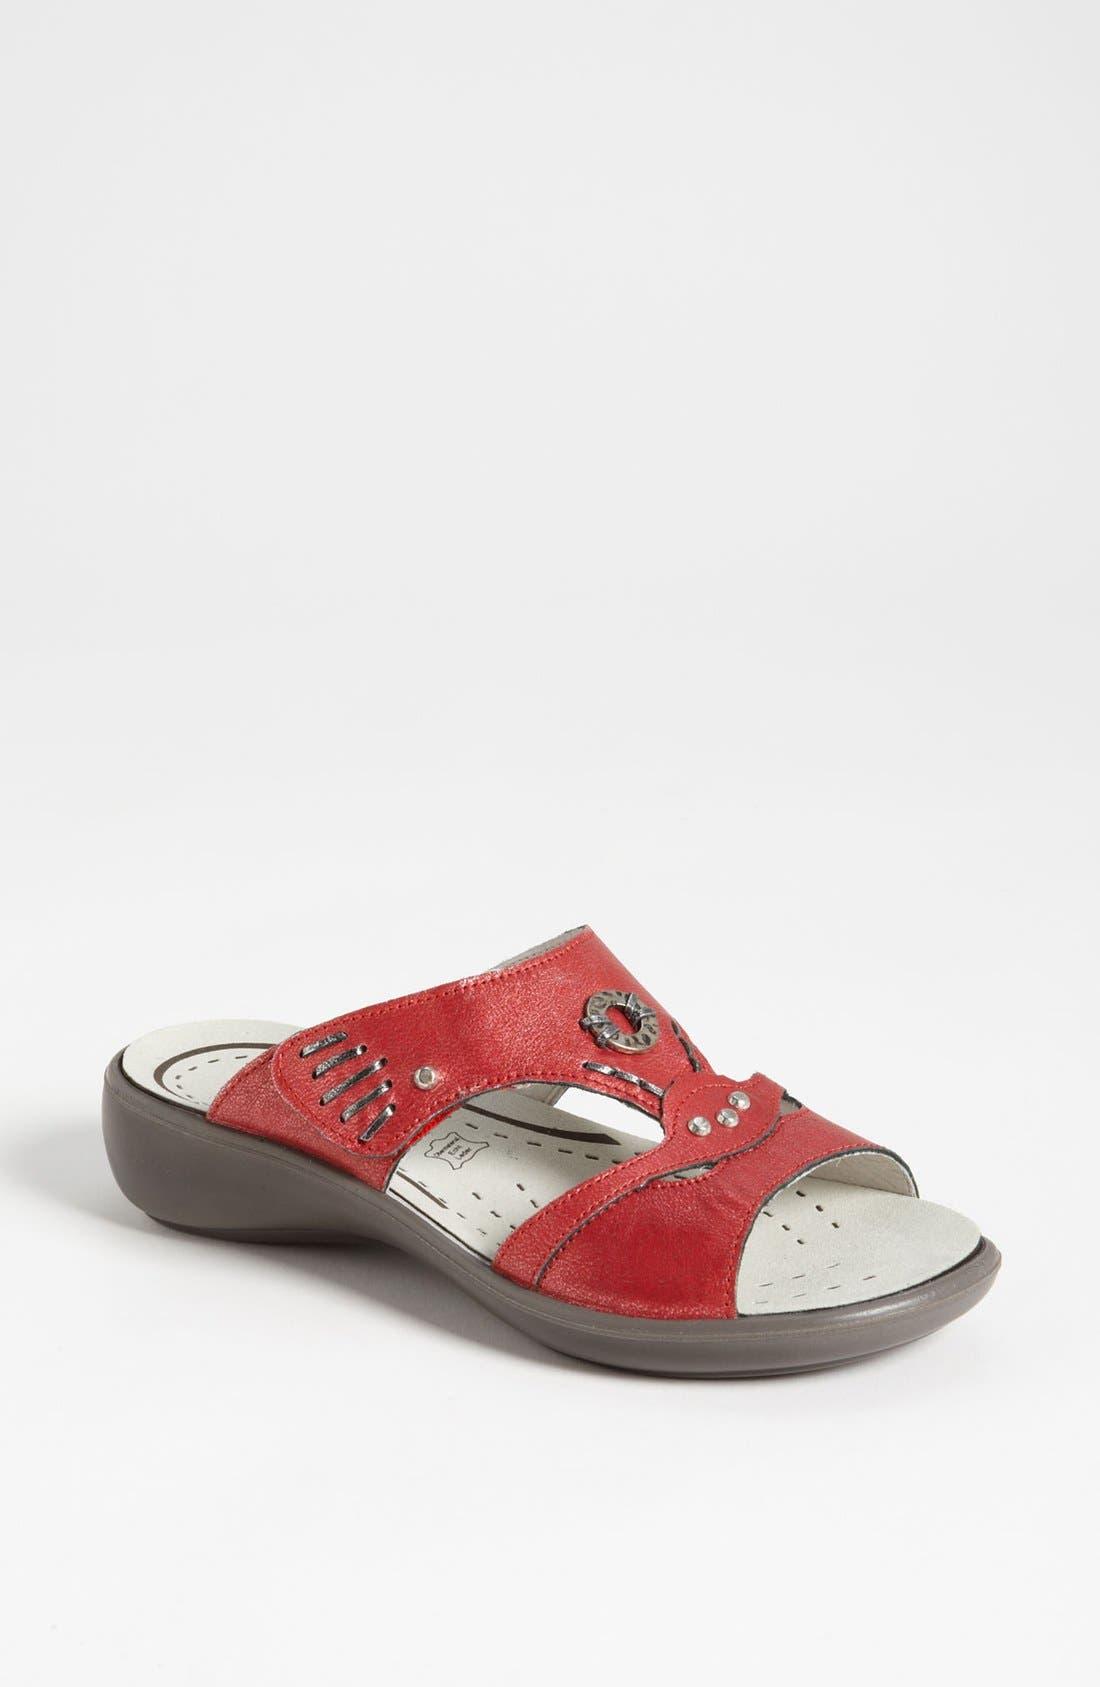 Main Image - Romika® 'Ibiza 36' Sandal